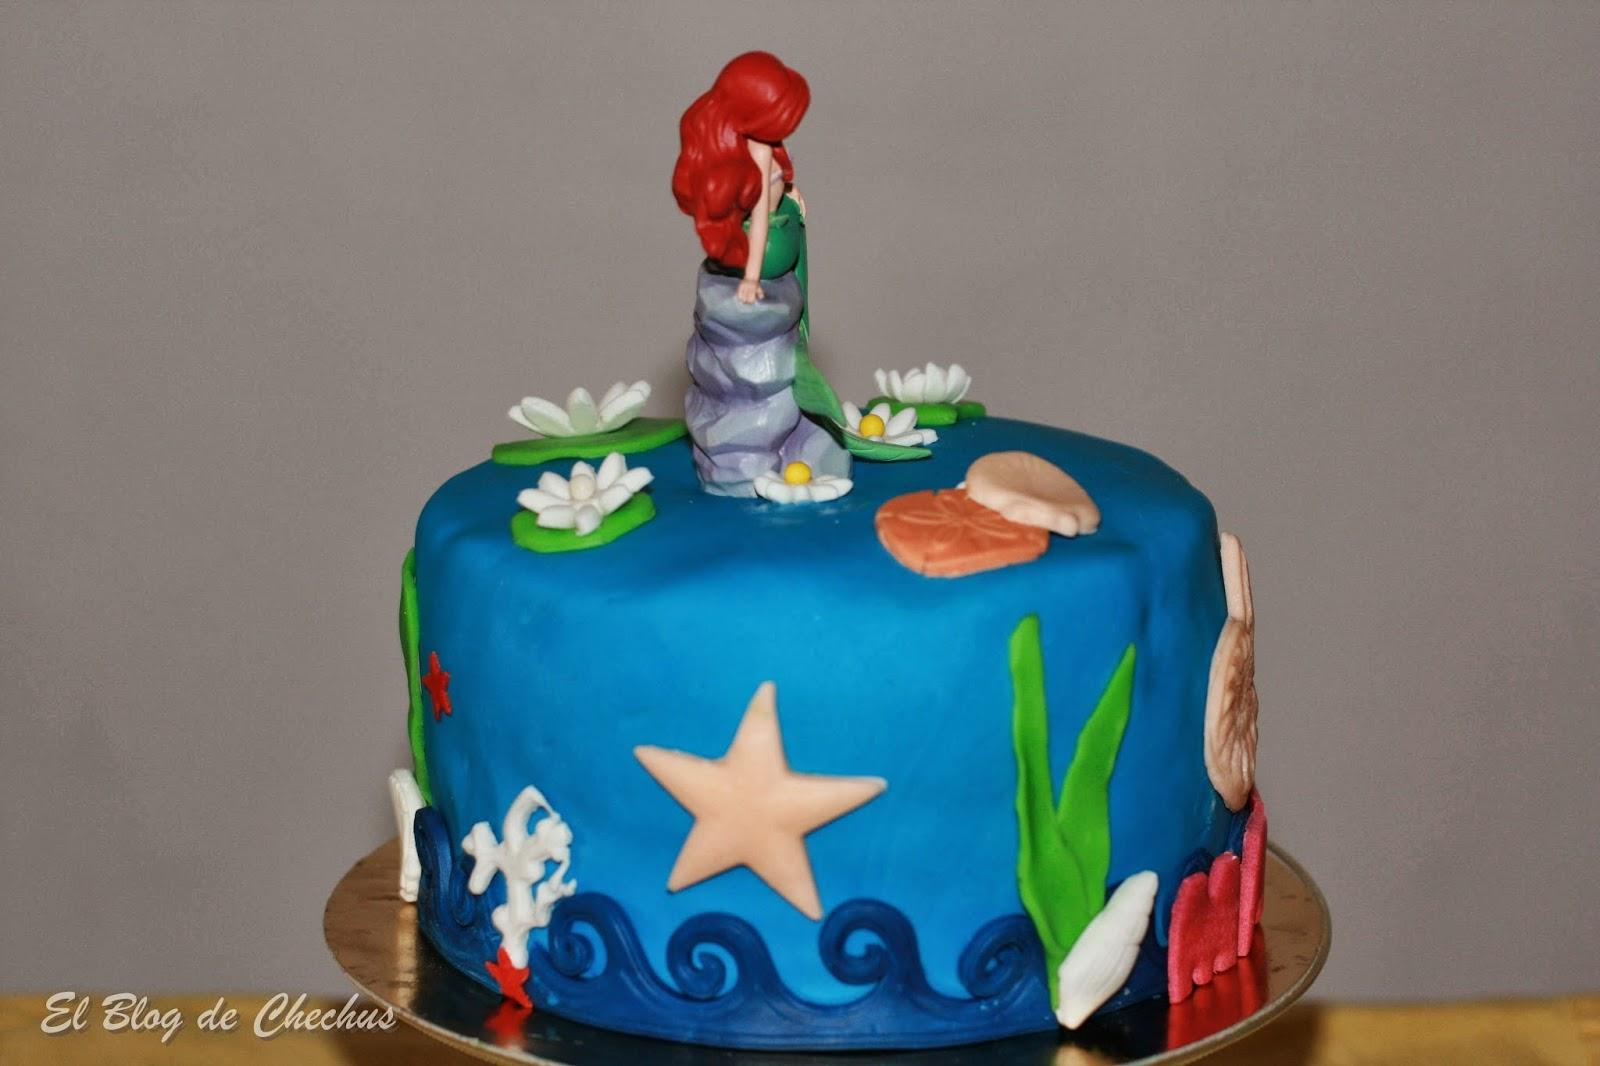 tartas decoradas, La Sirenita, Tarta de la Sirenita, el blog de chechus, Chechus Cupcakes